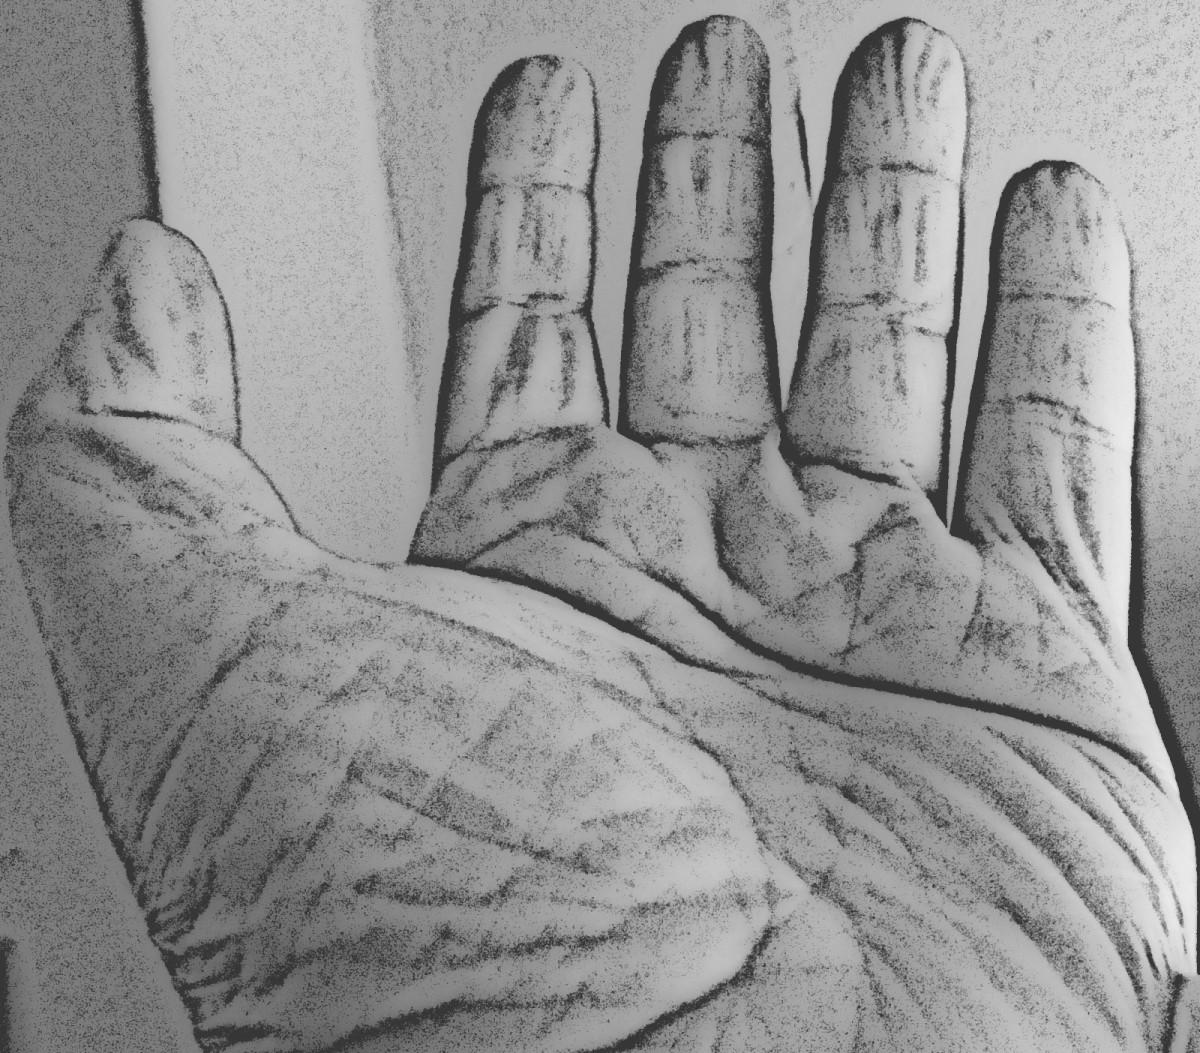 A Cat's Hand